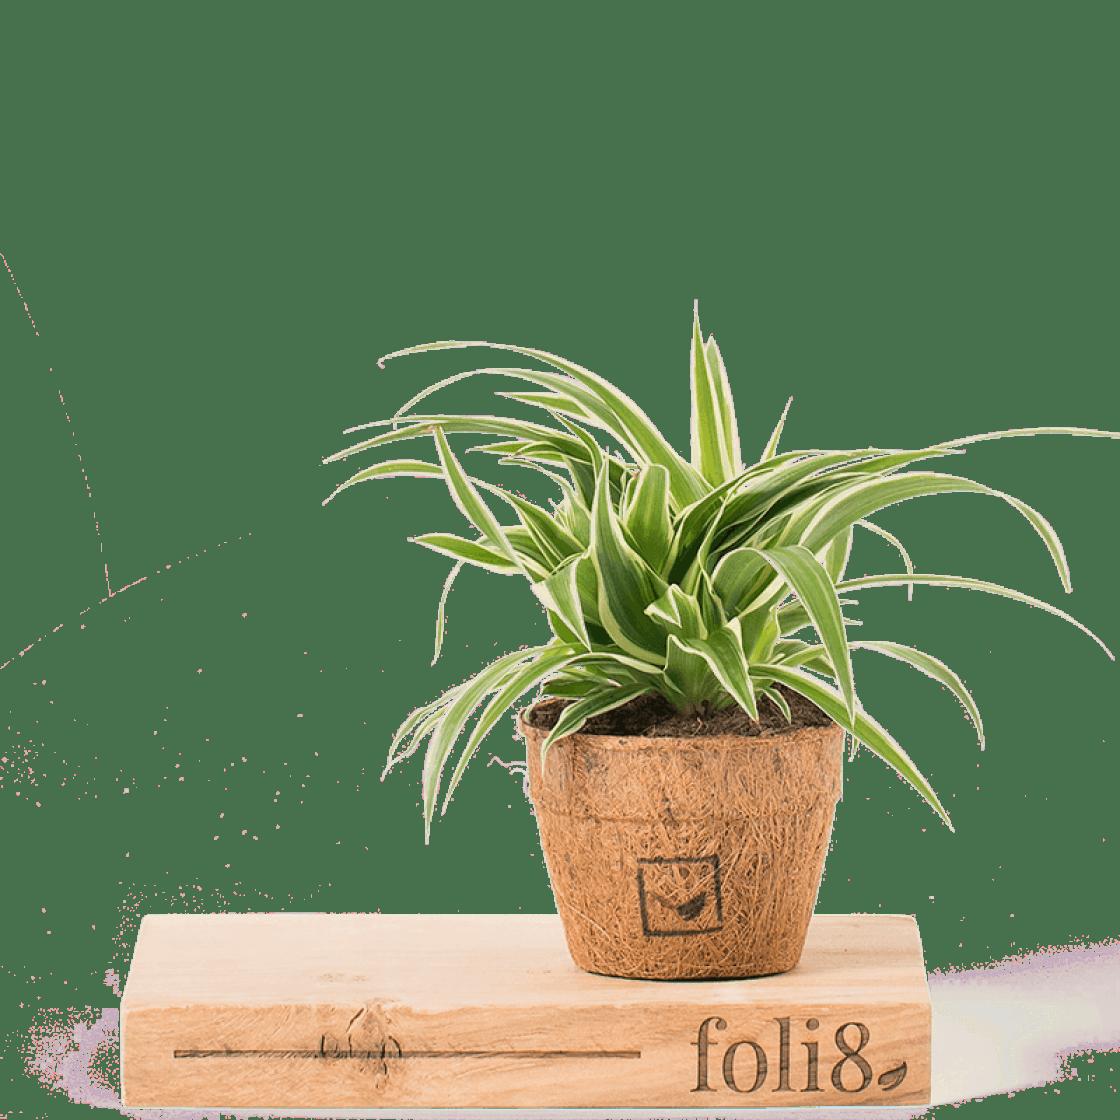 Bathroom plants 20 humidity loving houseplants to shop now